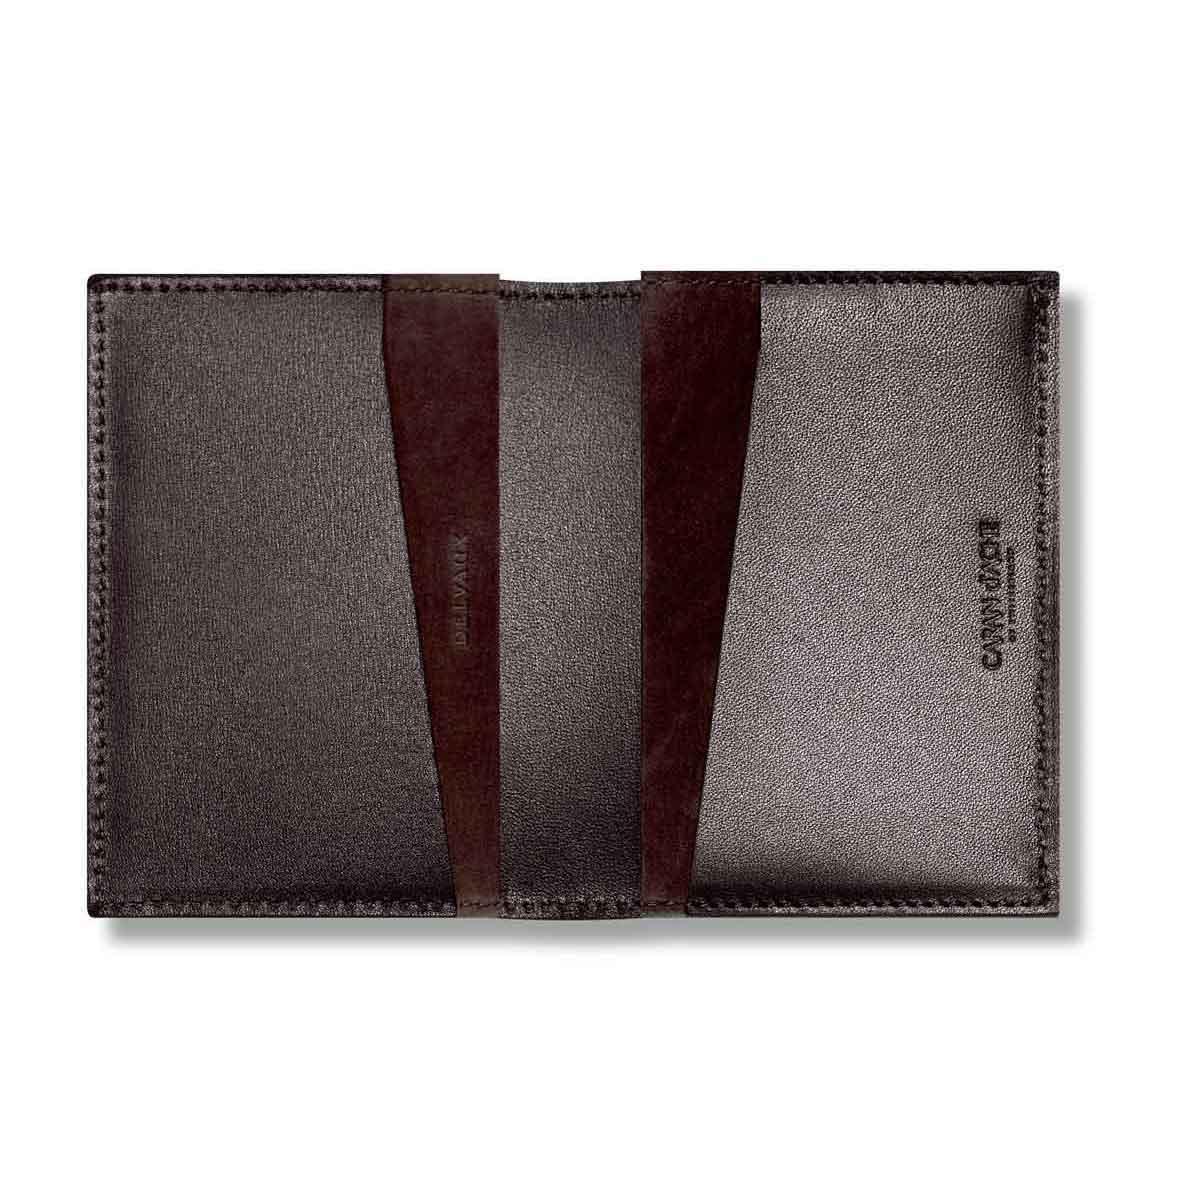 85c204a6e12a3a Add to My Lists. Caran d'Ache - Delvaux Leather Business Card Holder